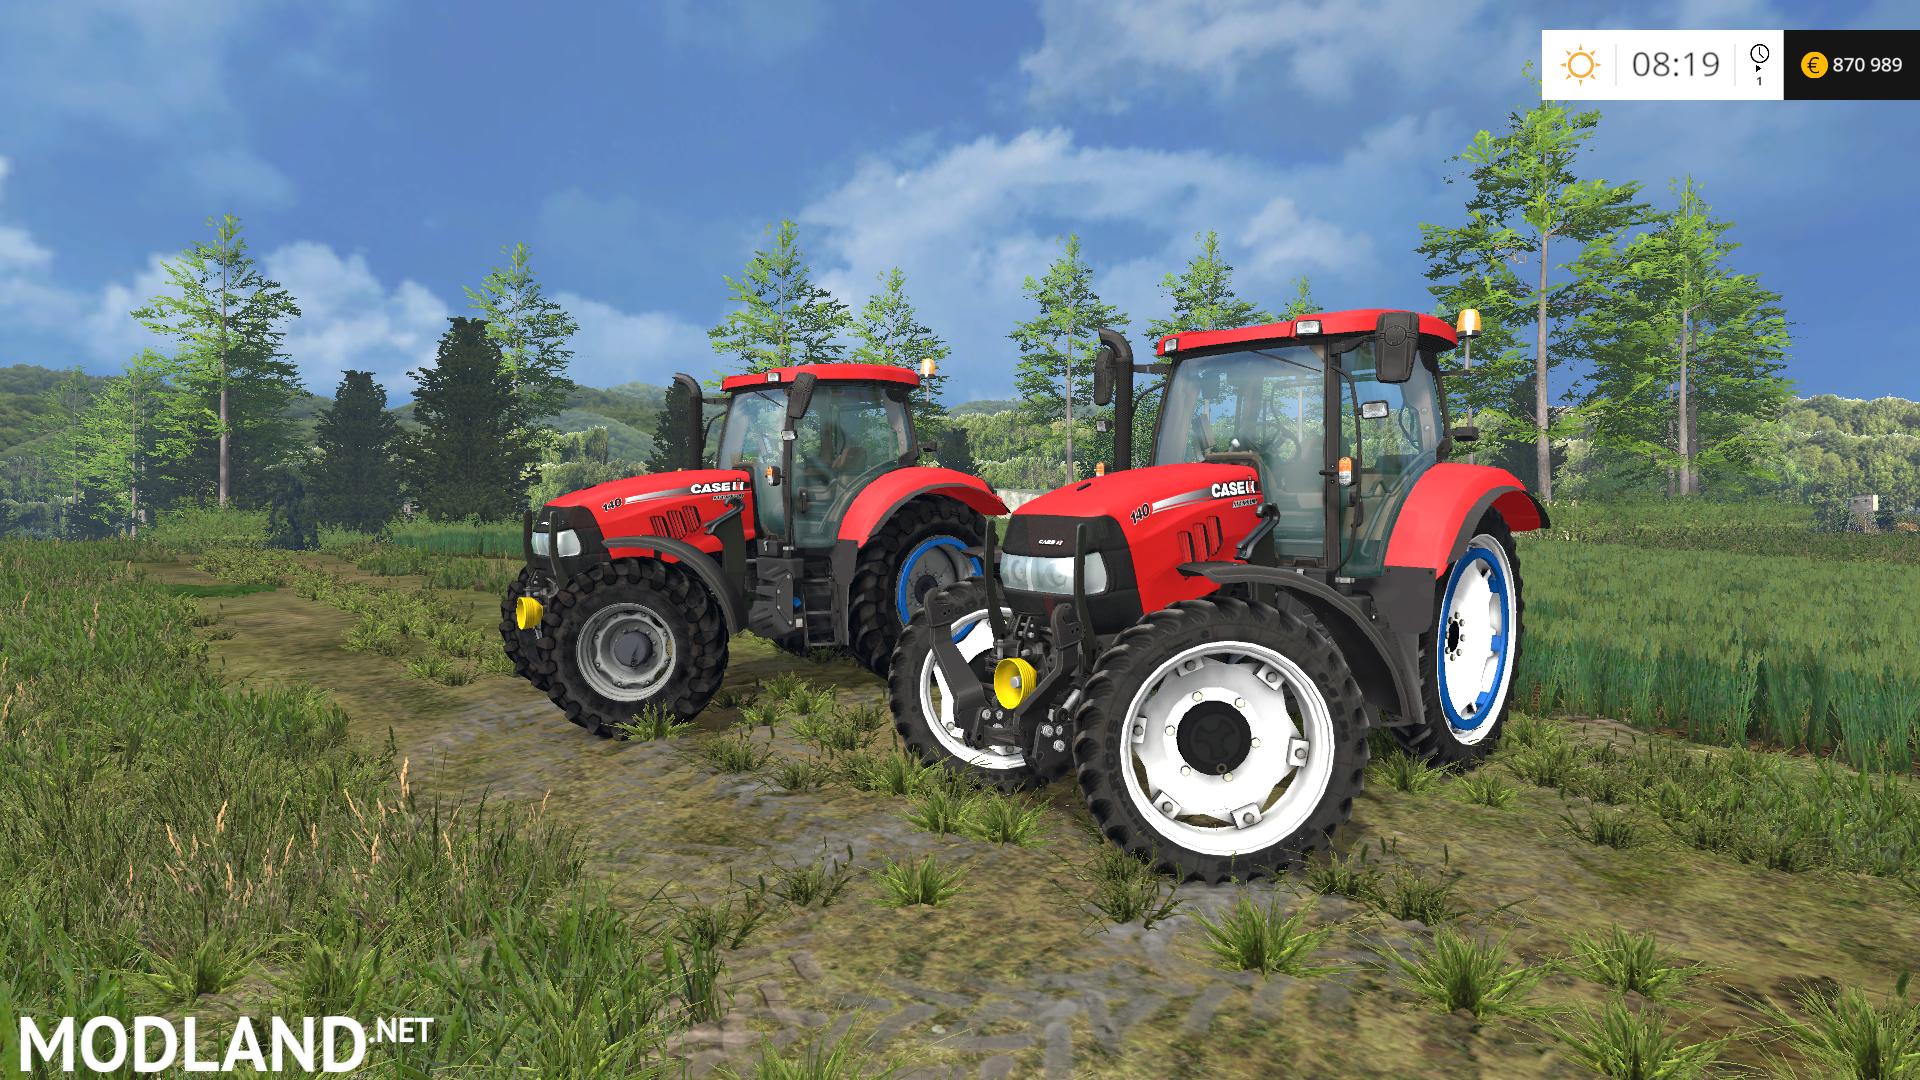 Case/International maxxum diesel tractor service and repair manual 5120 30 40